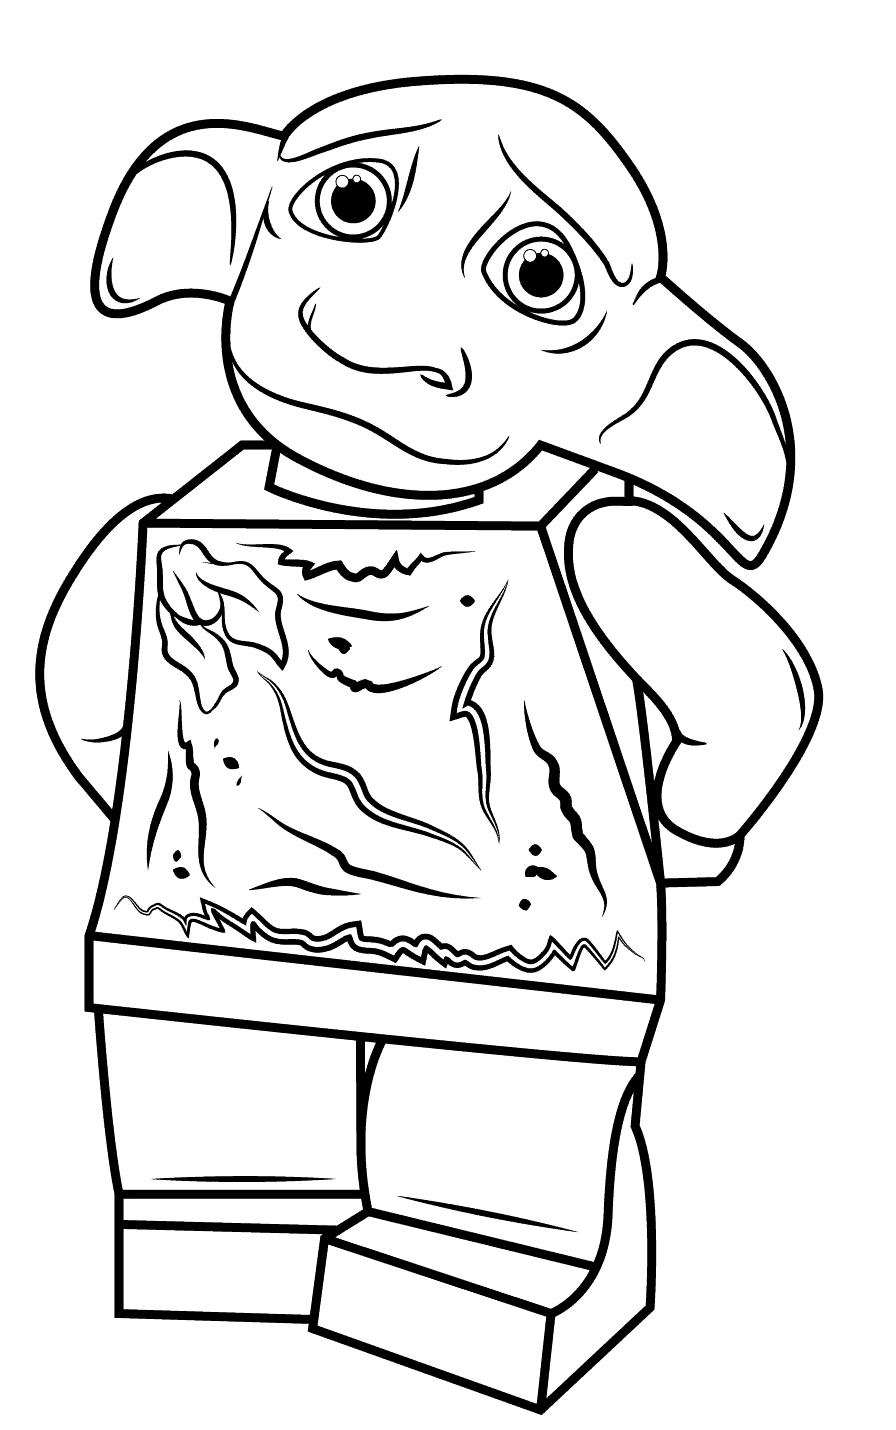 dobby-harry-potter-lego-colouring-page-printable  Dobby harry